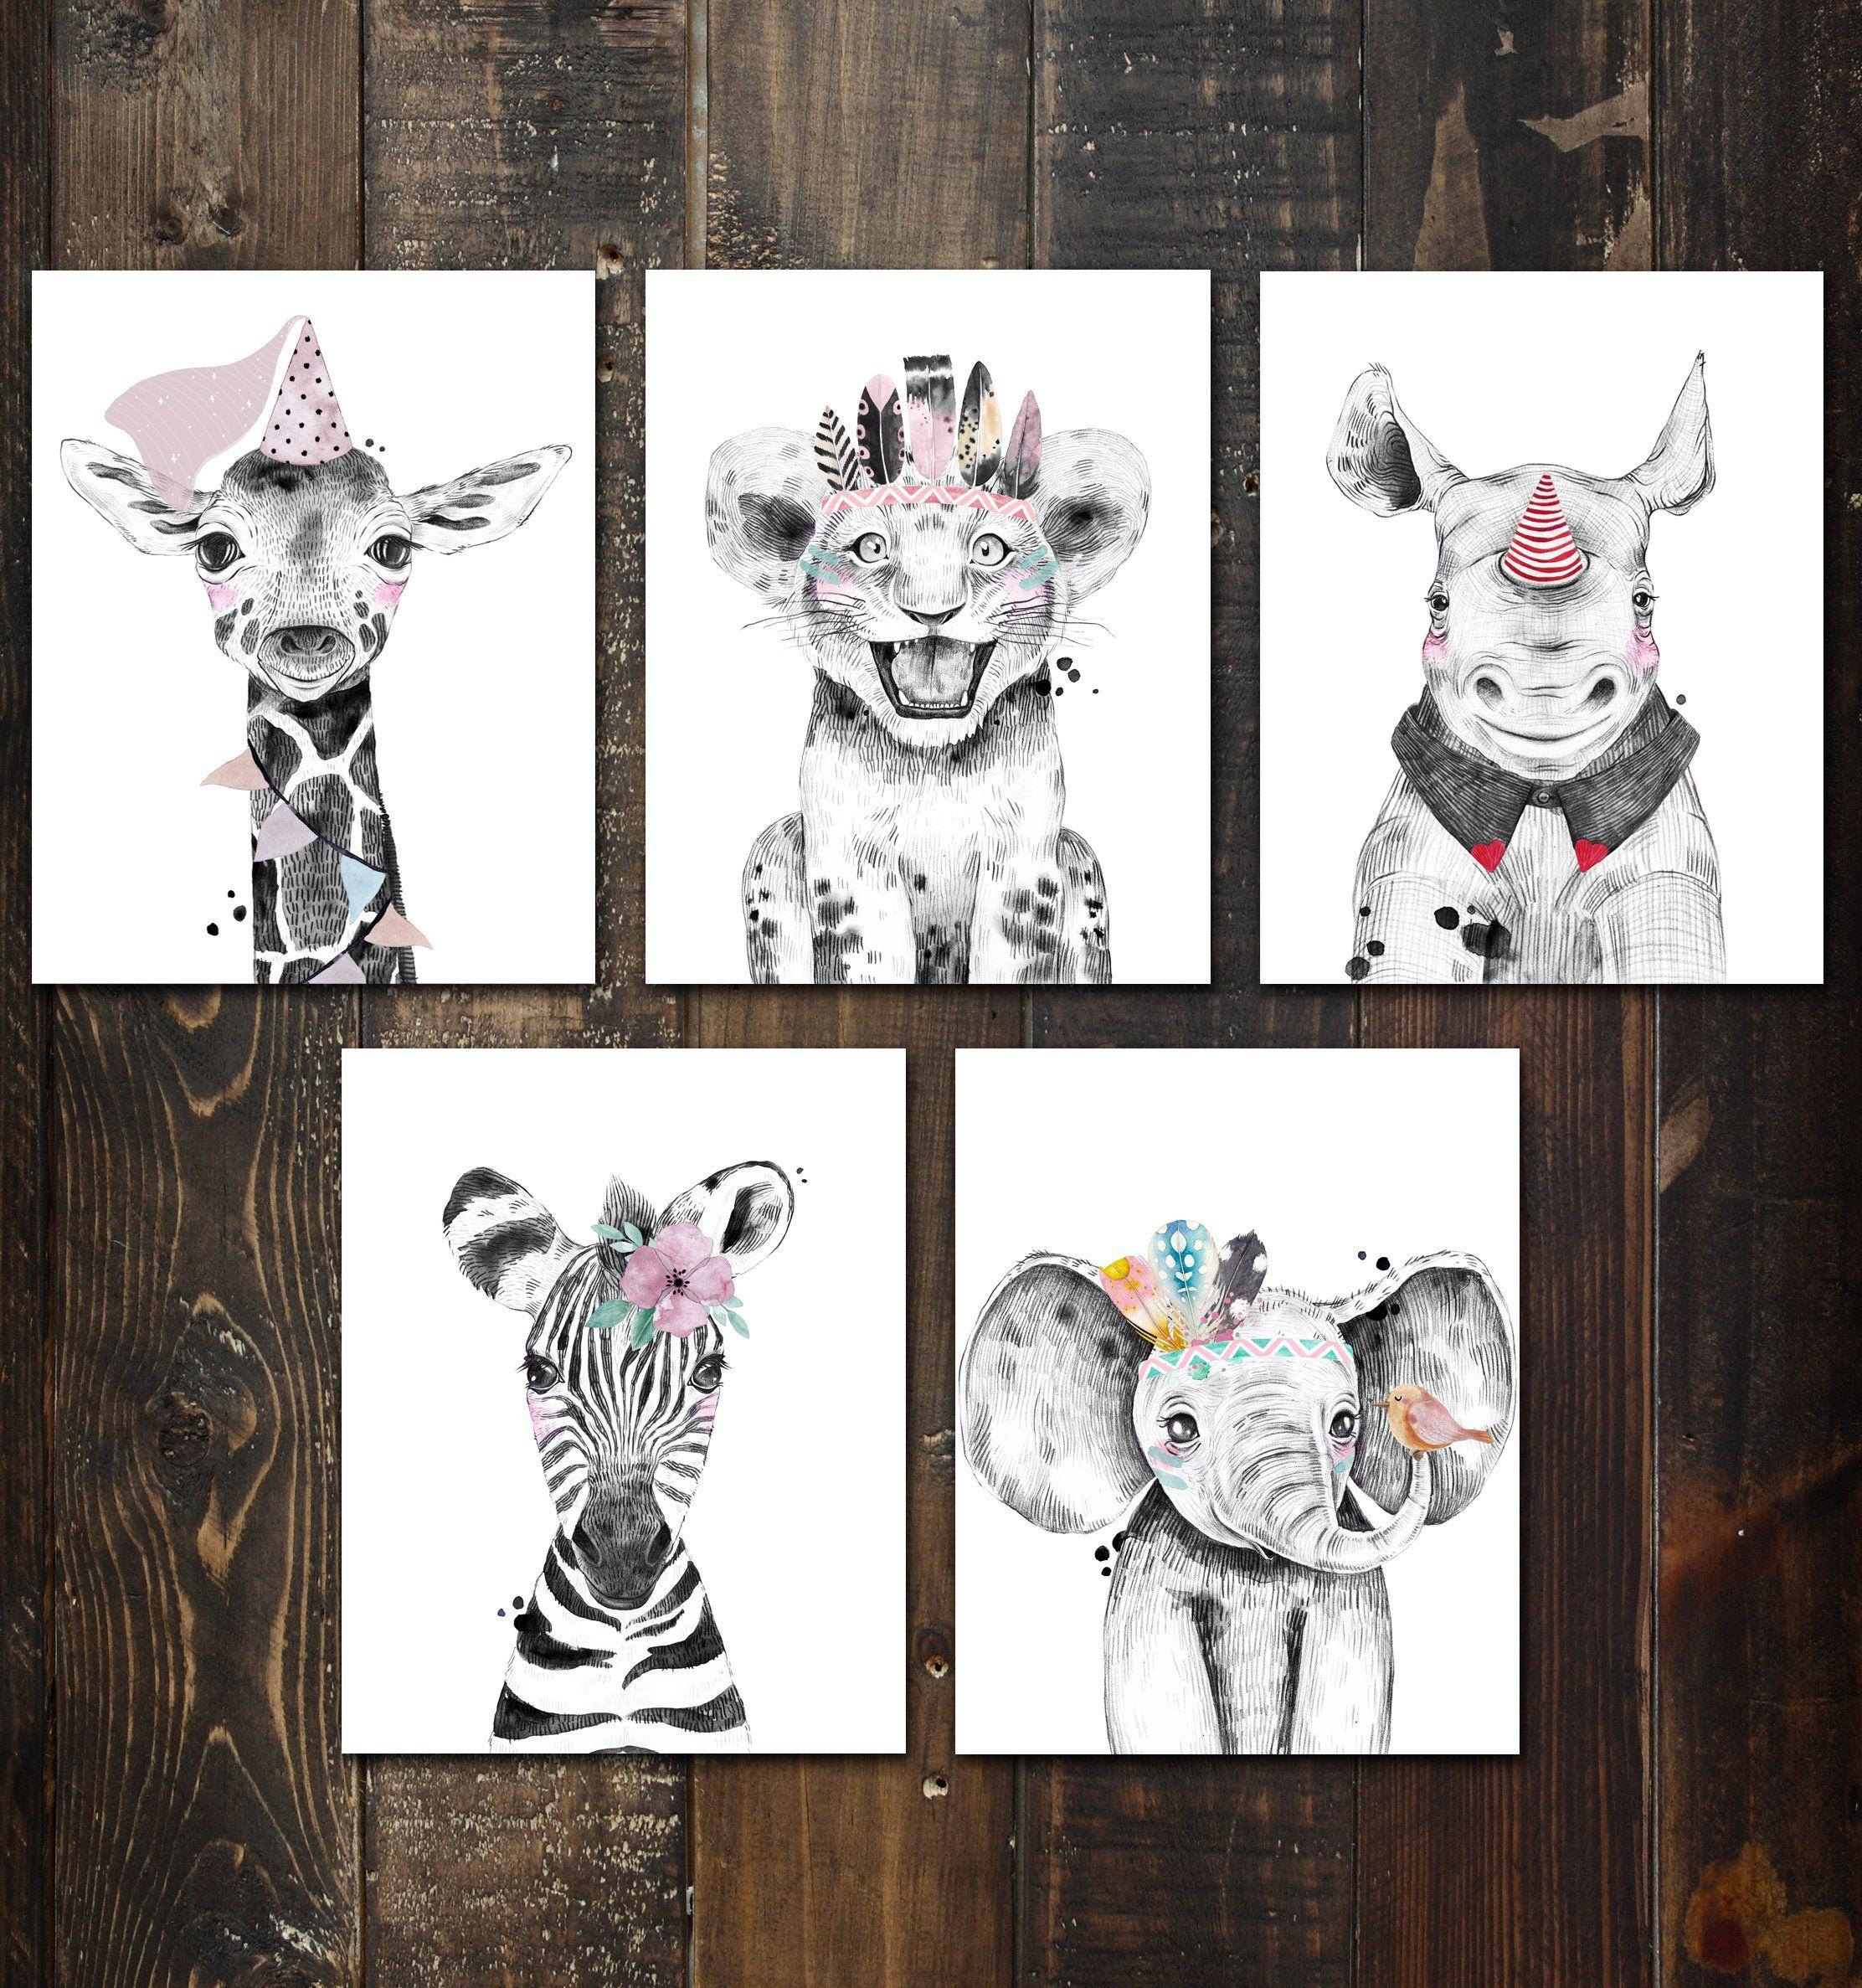 Nursery Safari Baby Animal Posters Set Of 5 Prints Unframed Great Gifts For Baby Shower Kids Bedroom Or Bathroom Decor Baby Elephant Giraffe Rhino Lion And Zebra P1022 Safari Nursery Baby